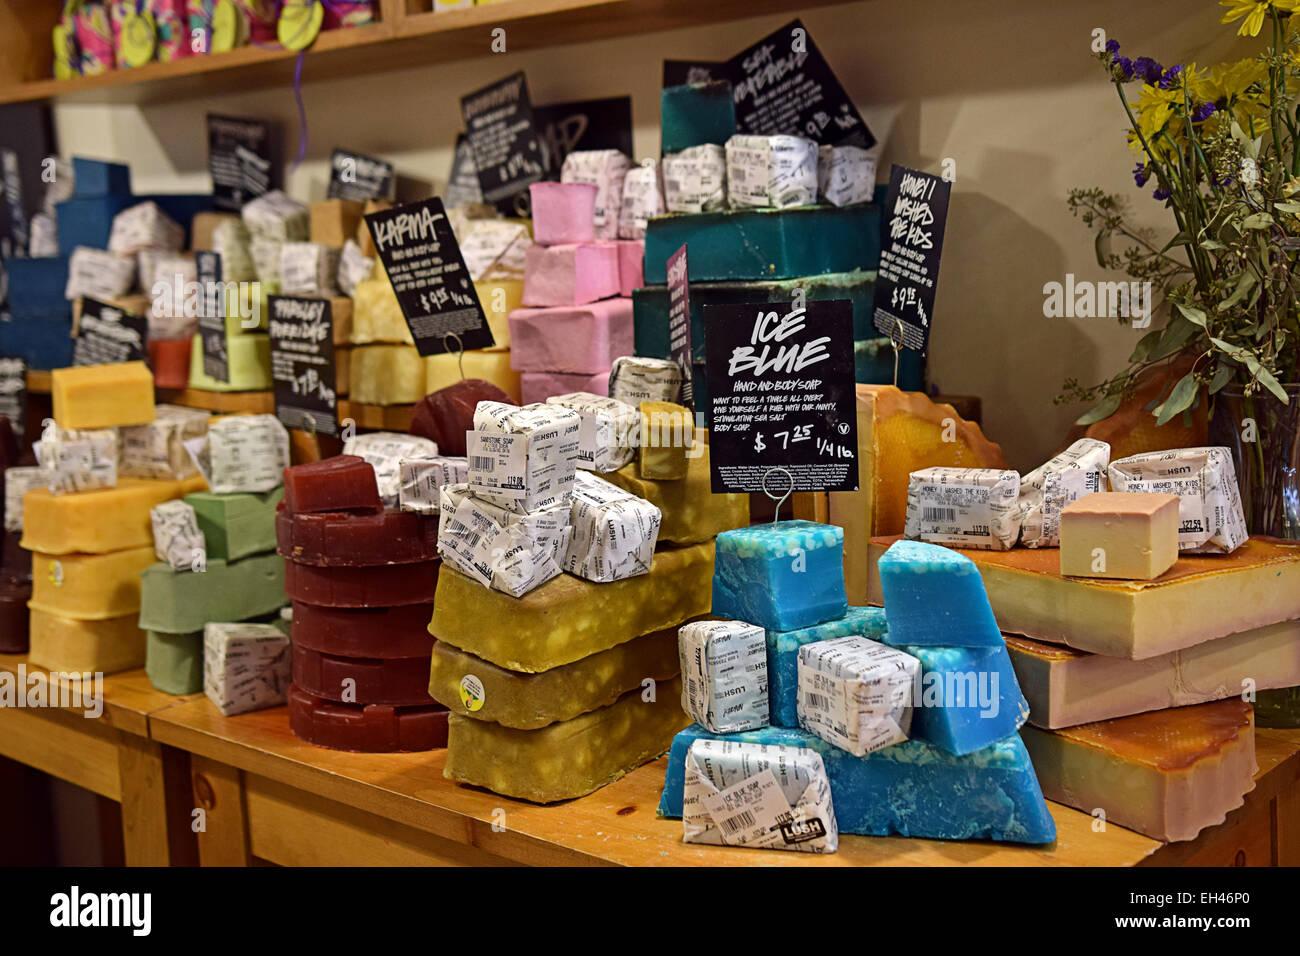 Soap | LUSH Cosmetics